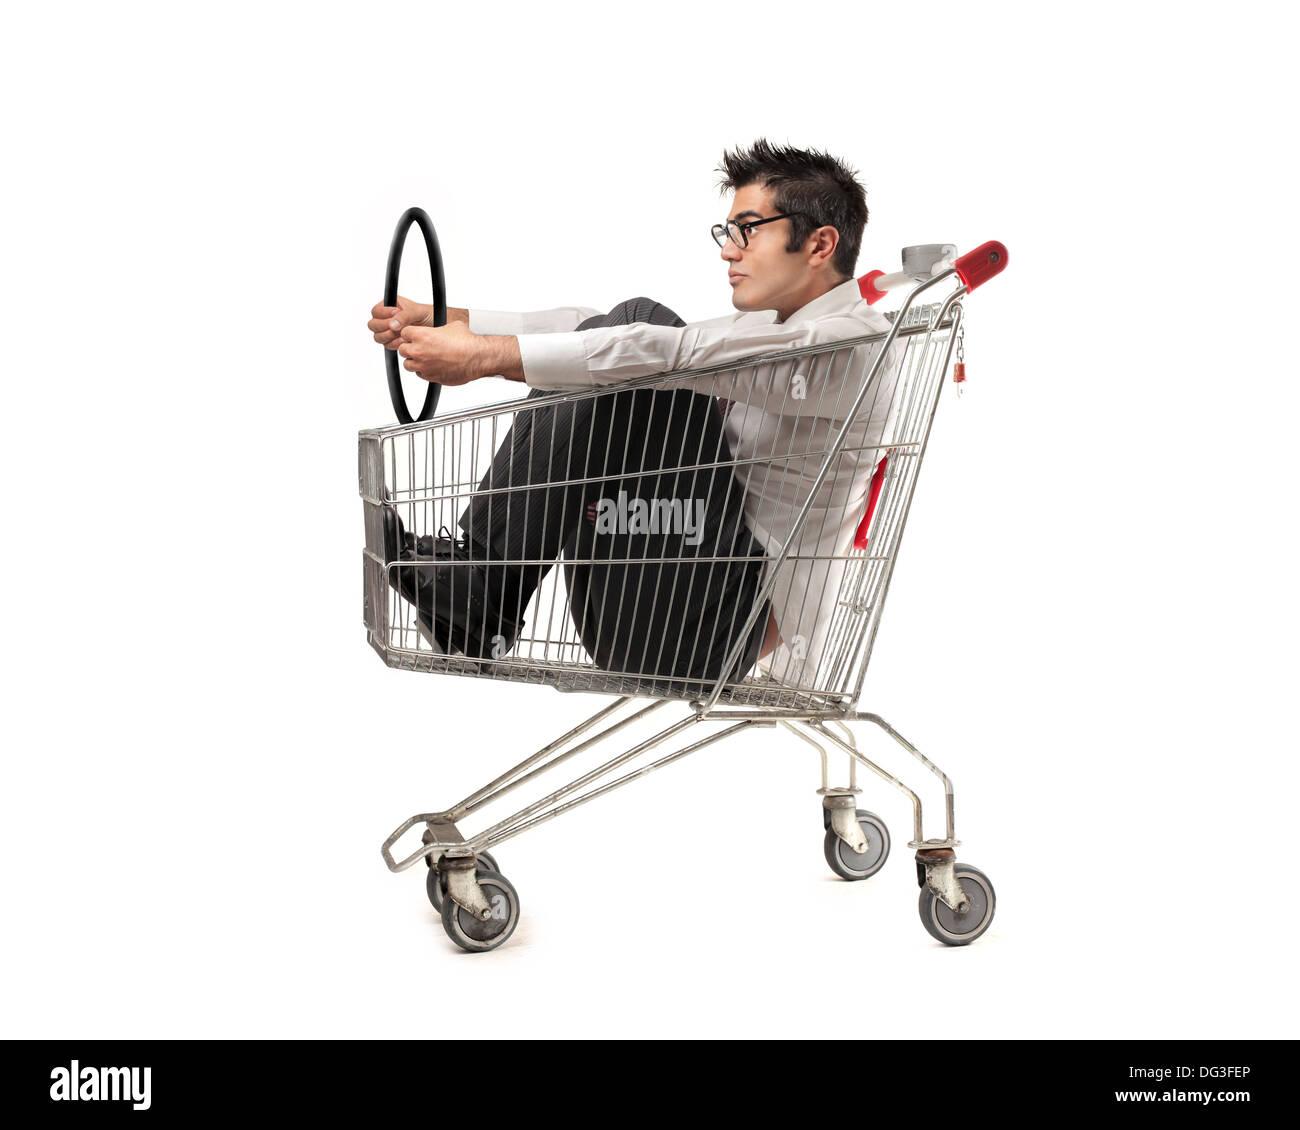 office trolley cart. Office Worker On A Shopping Cart Holding Steering Wheel Trolley